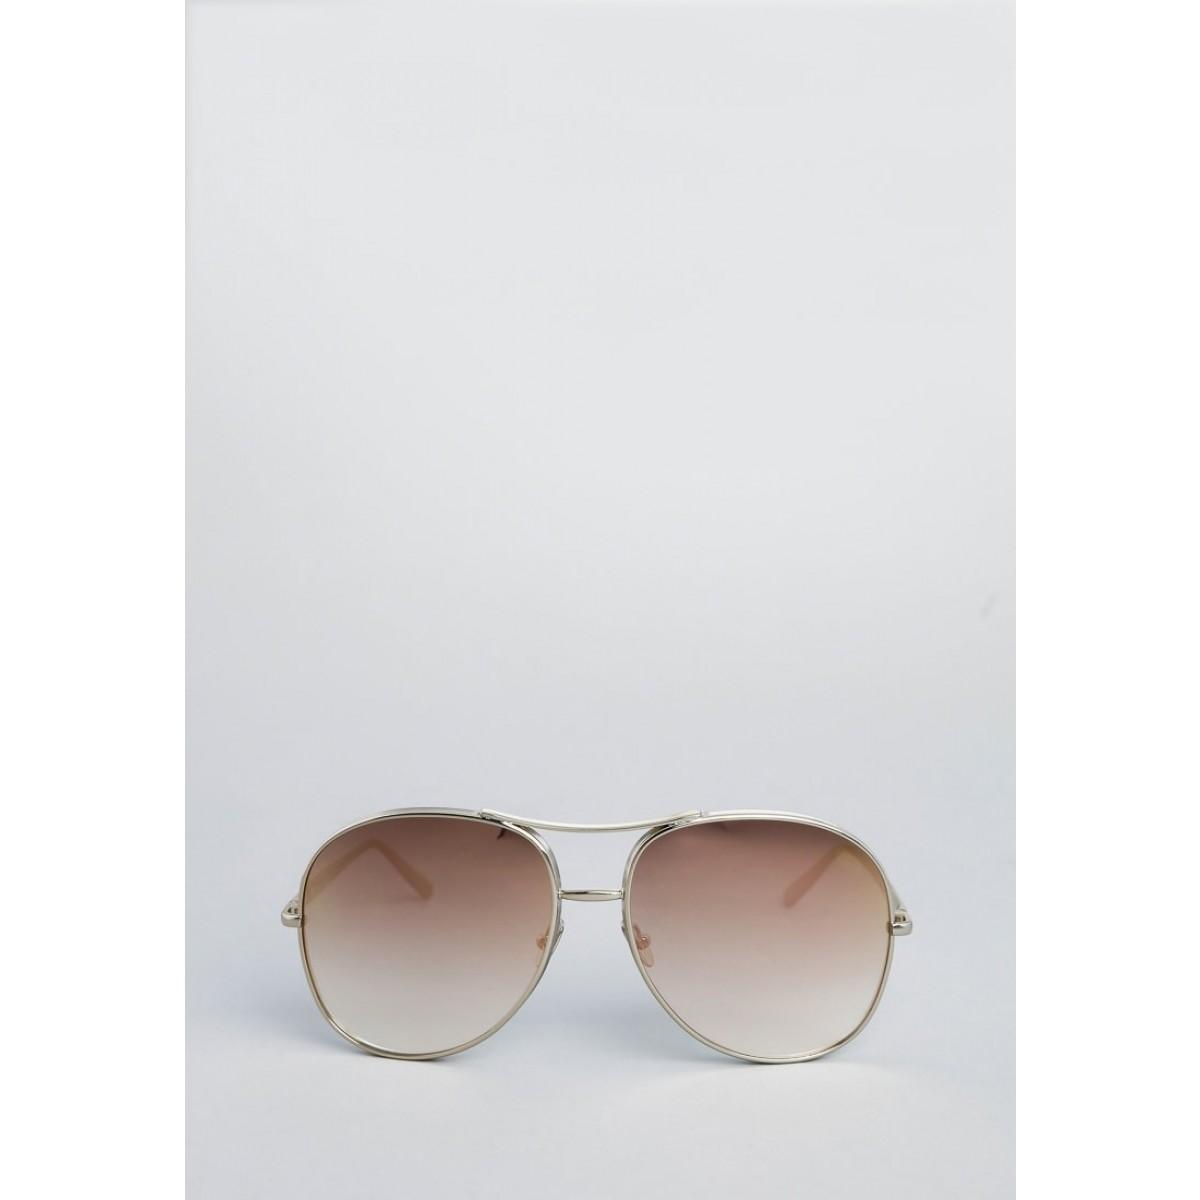 7c4abfb665c Chloe Jayme Rose Gold Aviator Women Sunglasses Cl-Ce127s-778-61 - Women  Sunglasses - Sunglasses - Fashion World